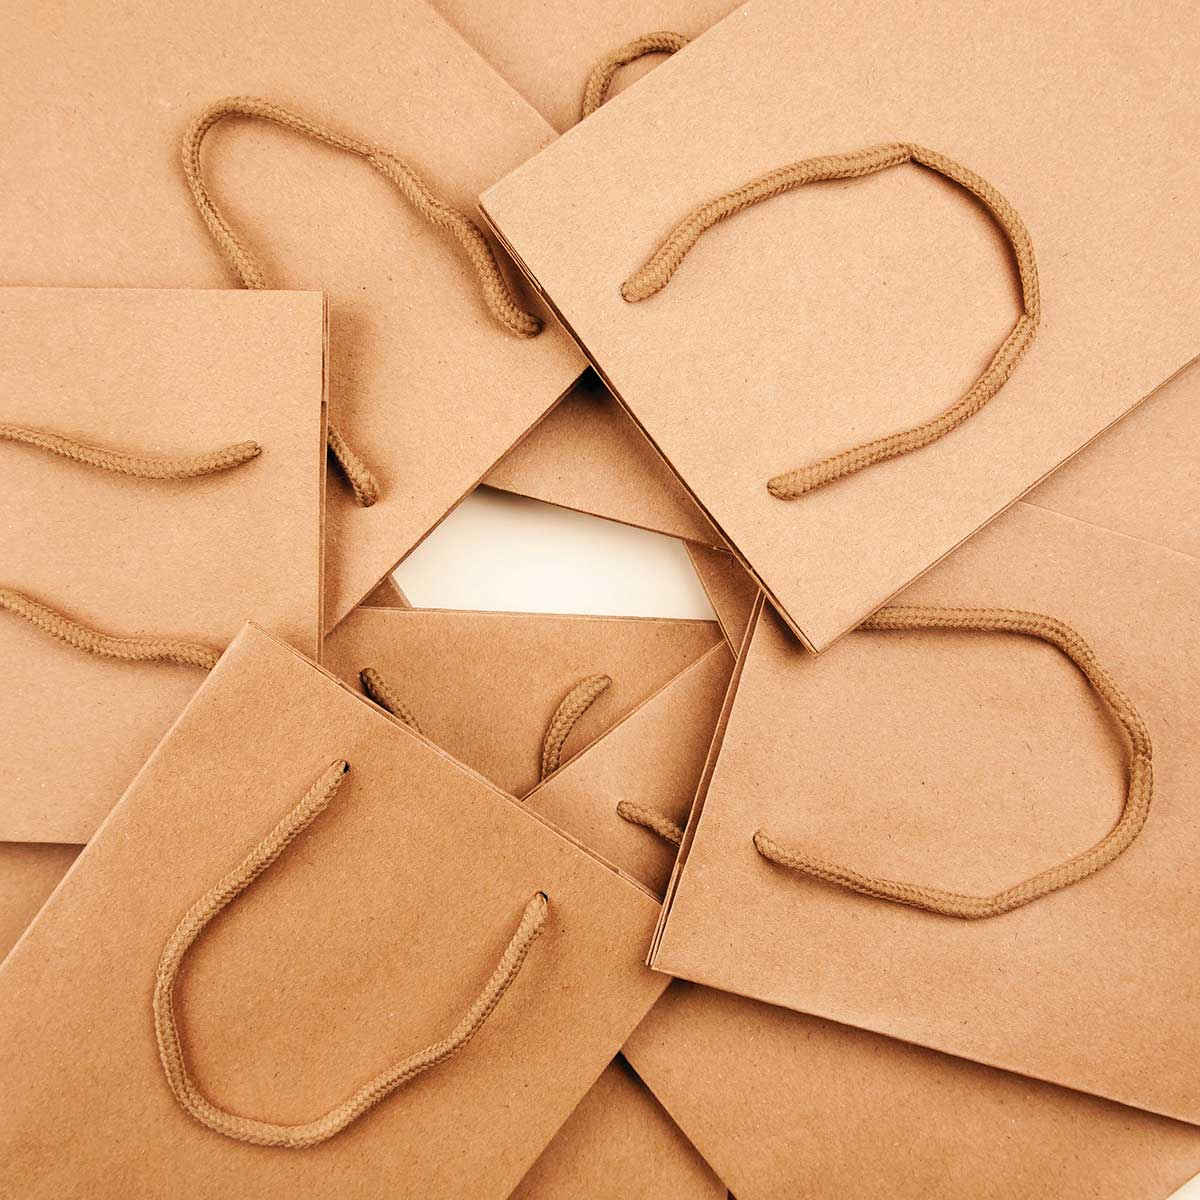 Paper Bag - Craft Paper